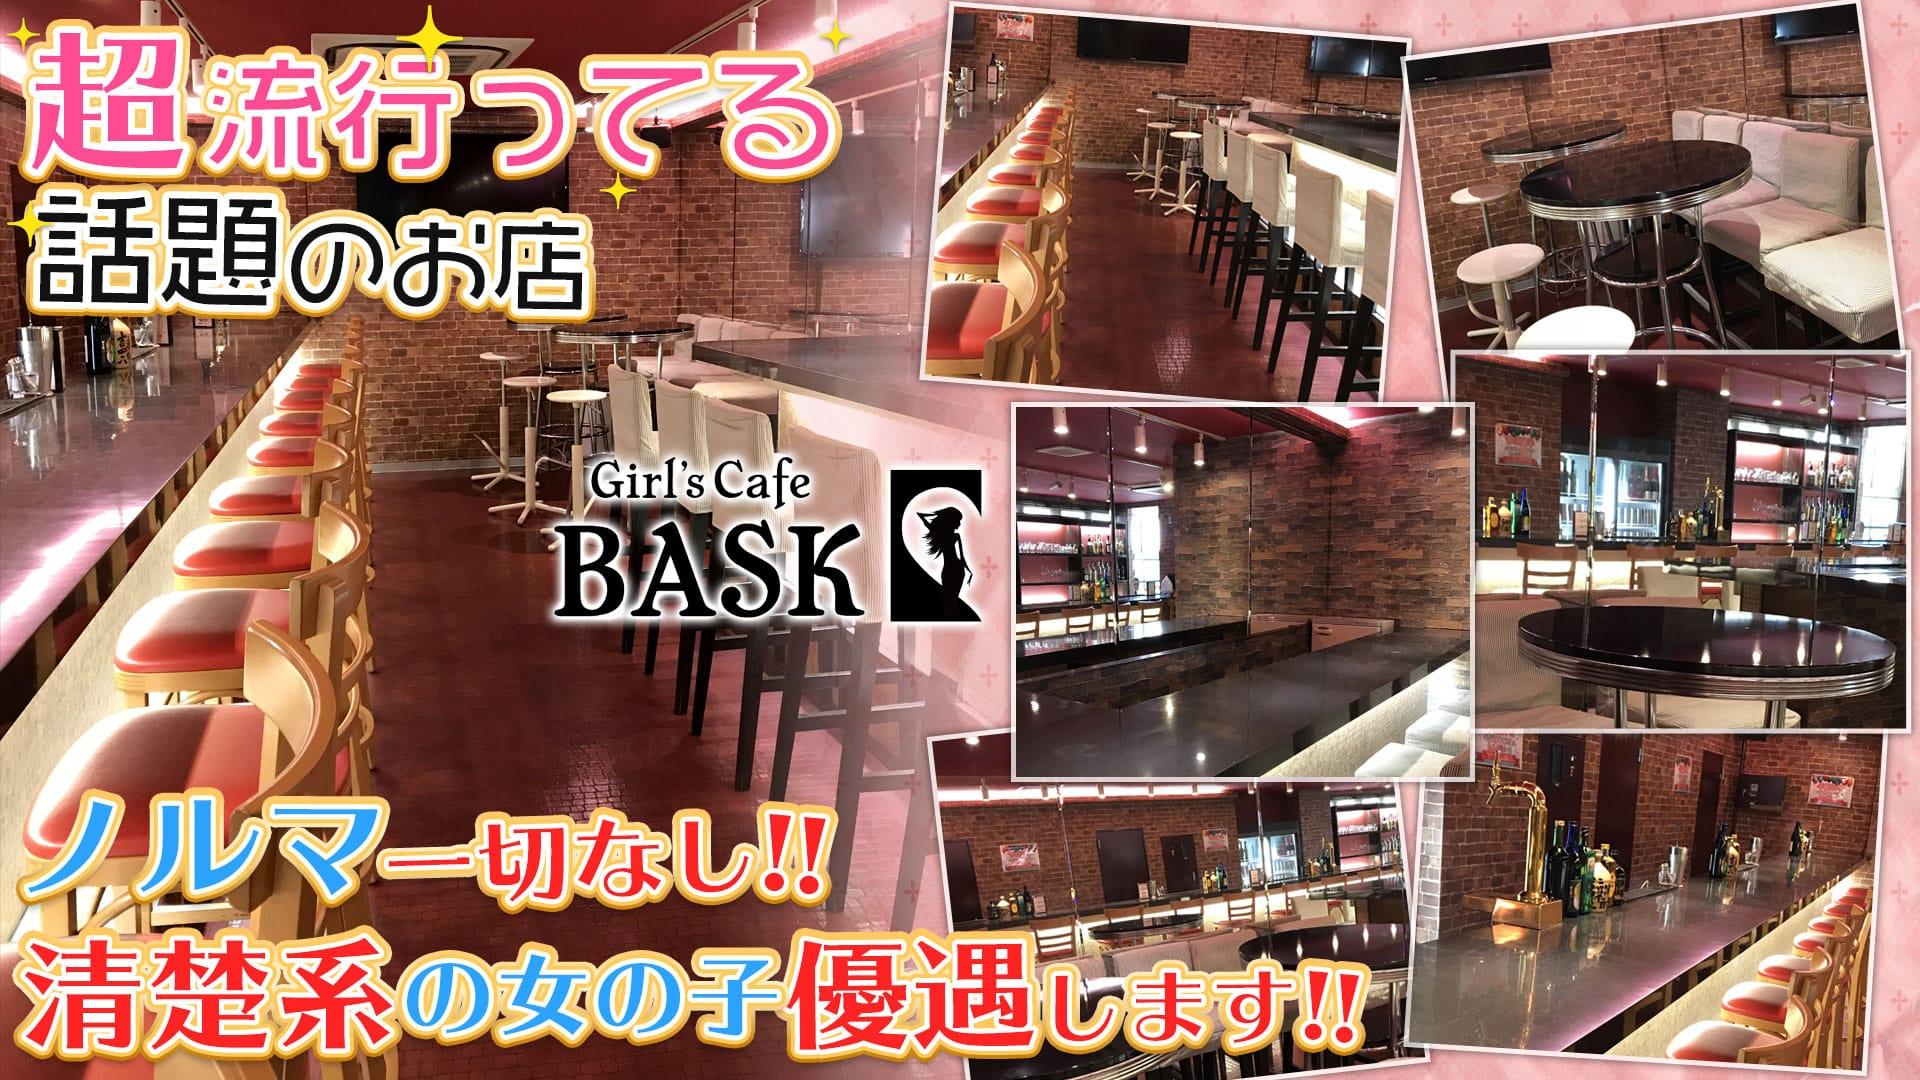 GIRL'S CAFE BASK<バスク> 町田 ガールズバー TOP画像